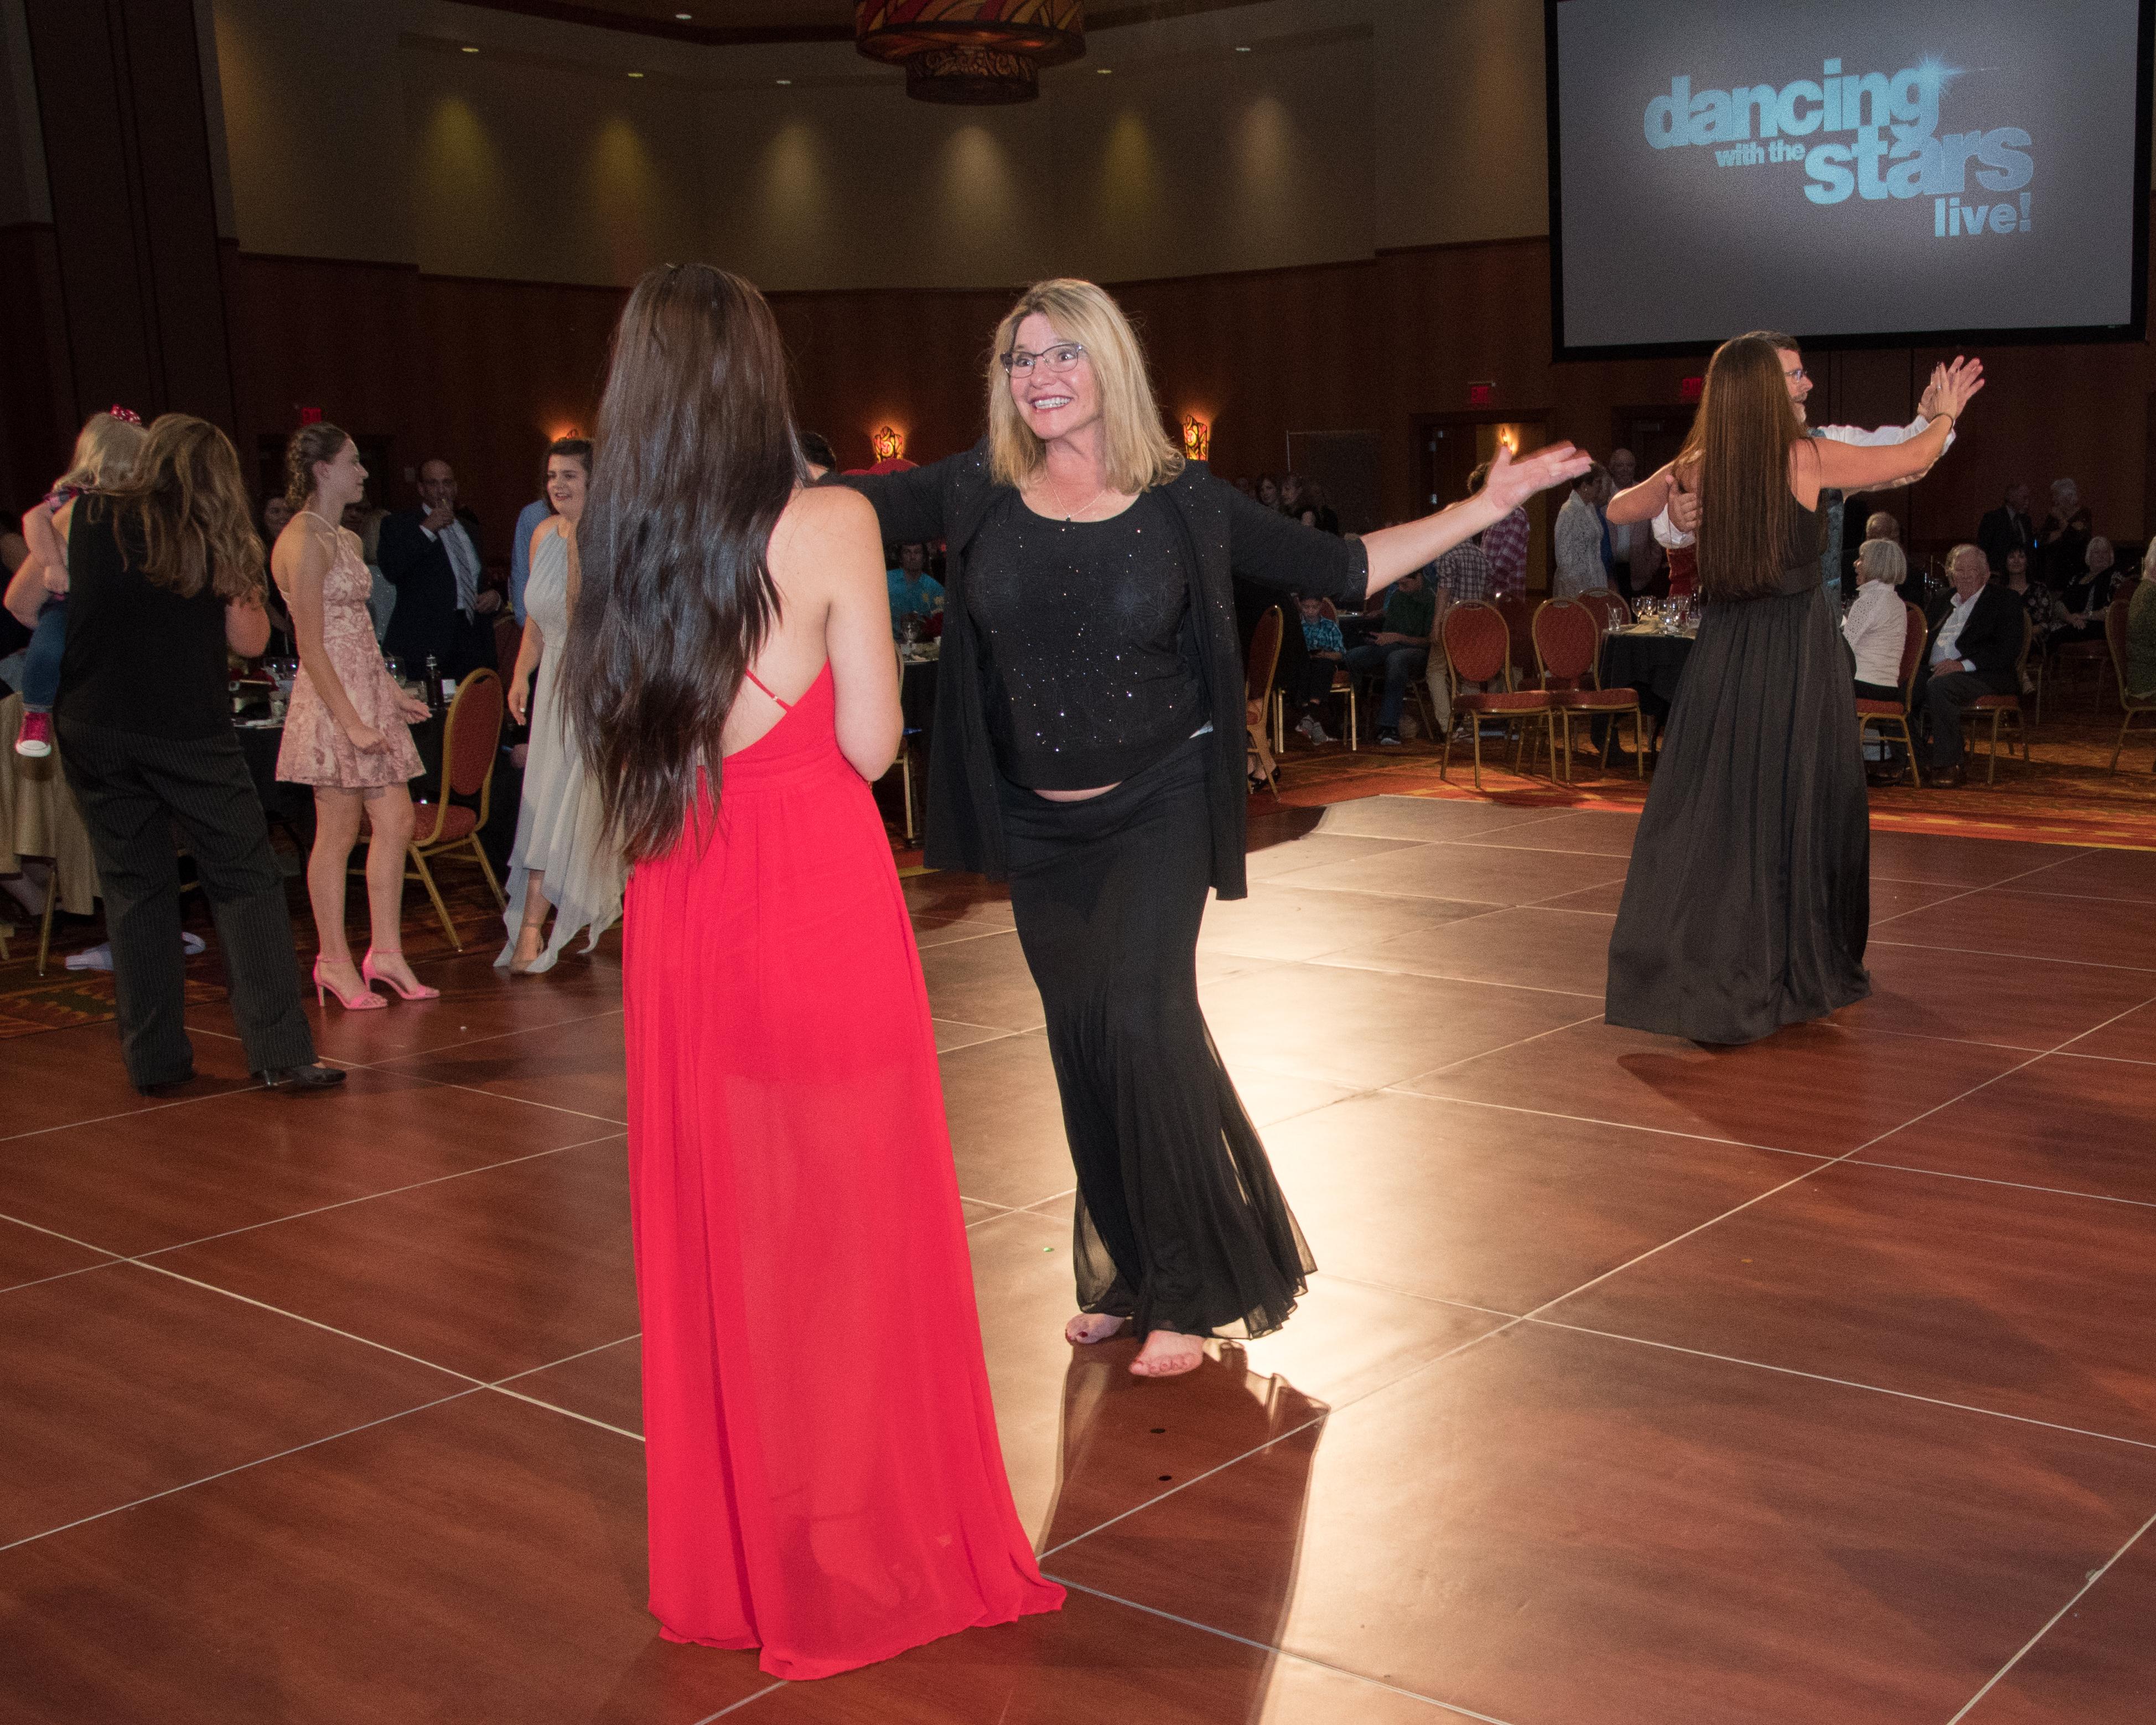 DancingStars2018-7340